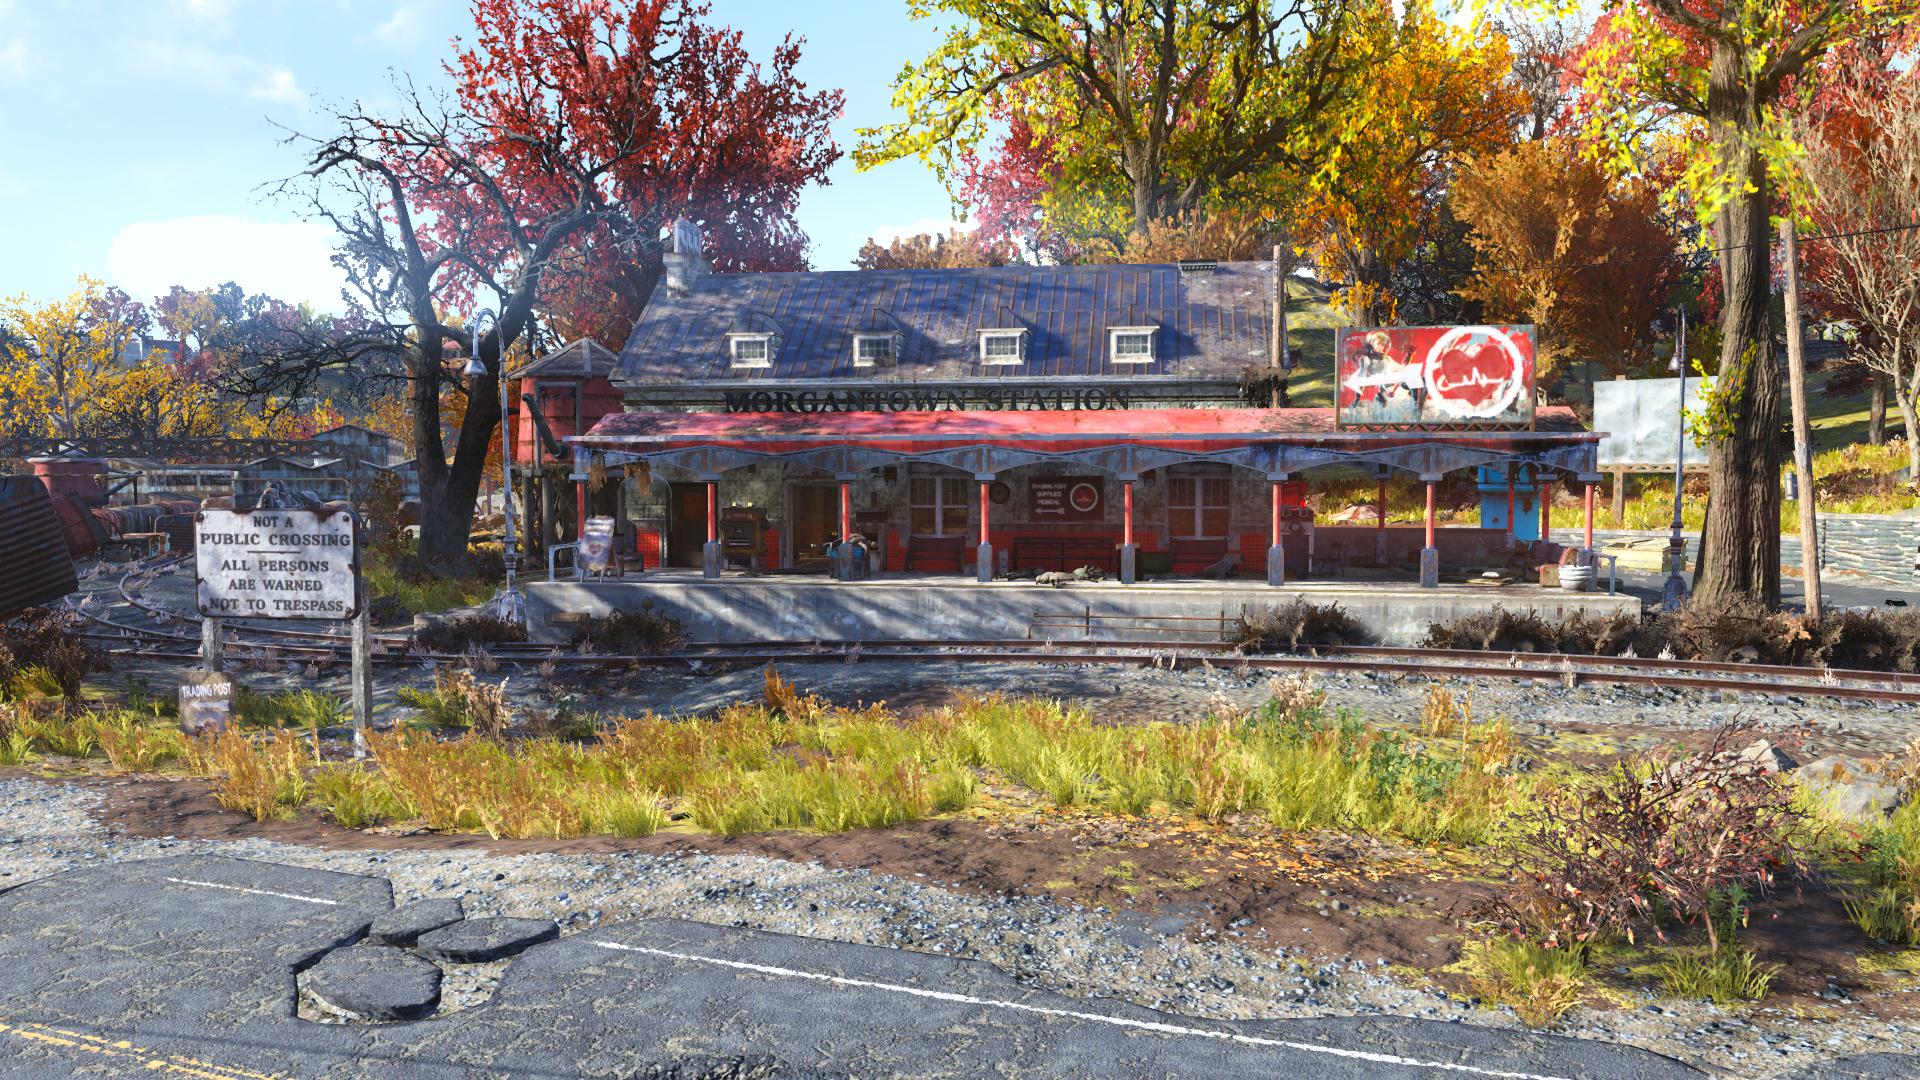 Morgantown Station Fallout 76 Vendors